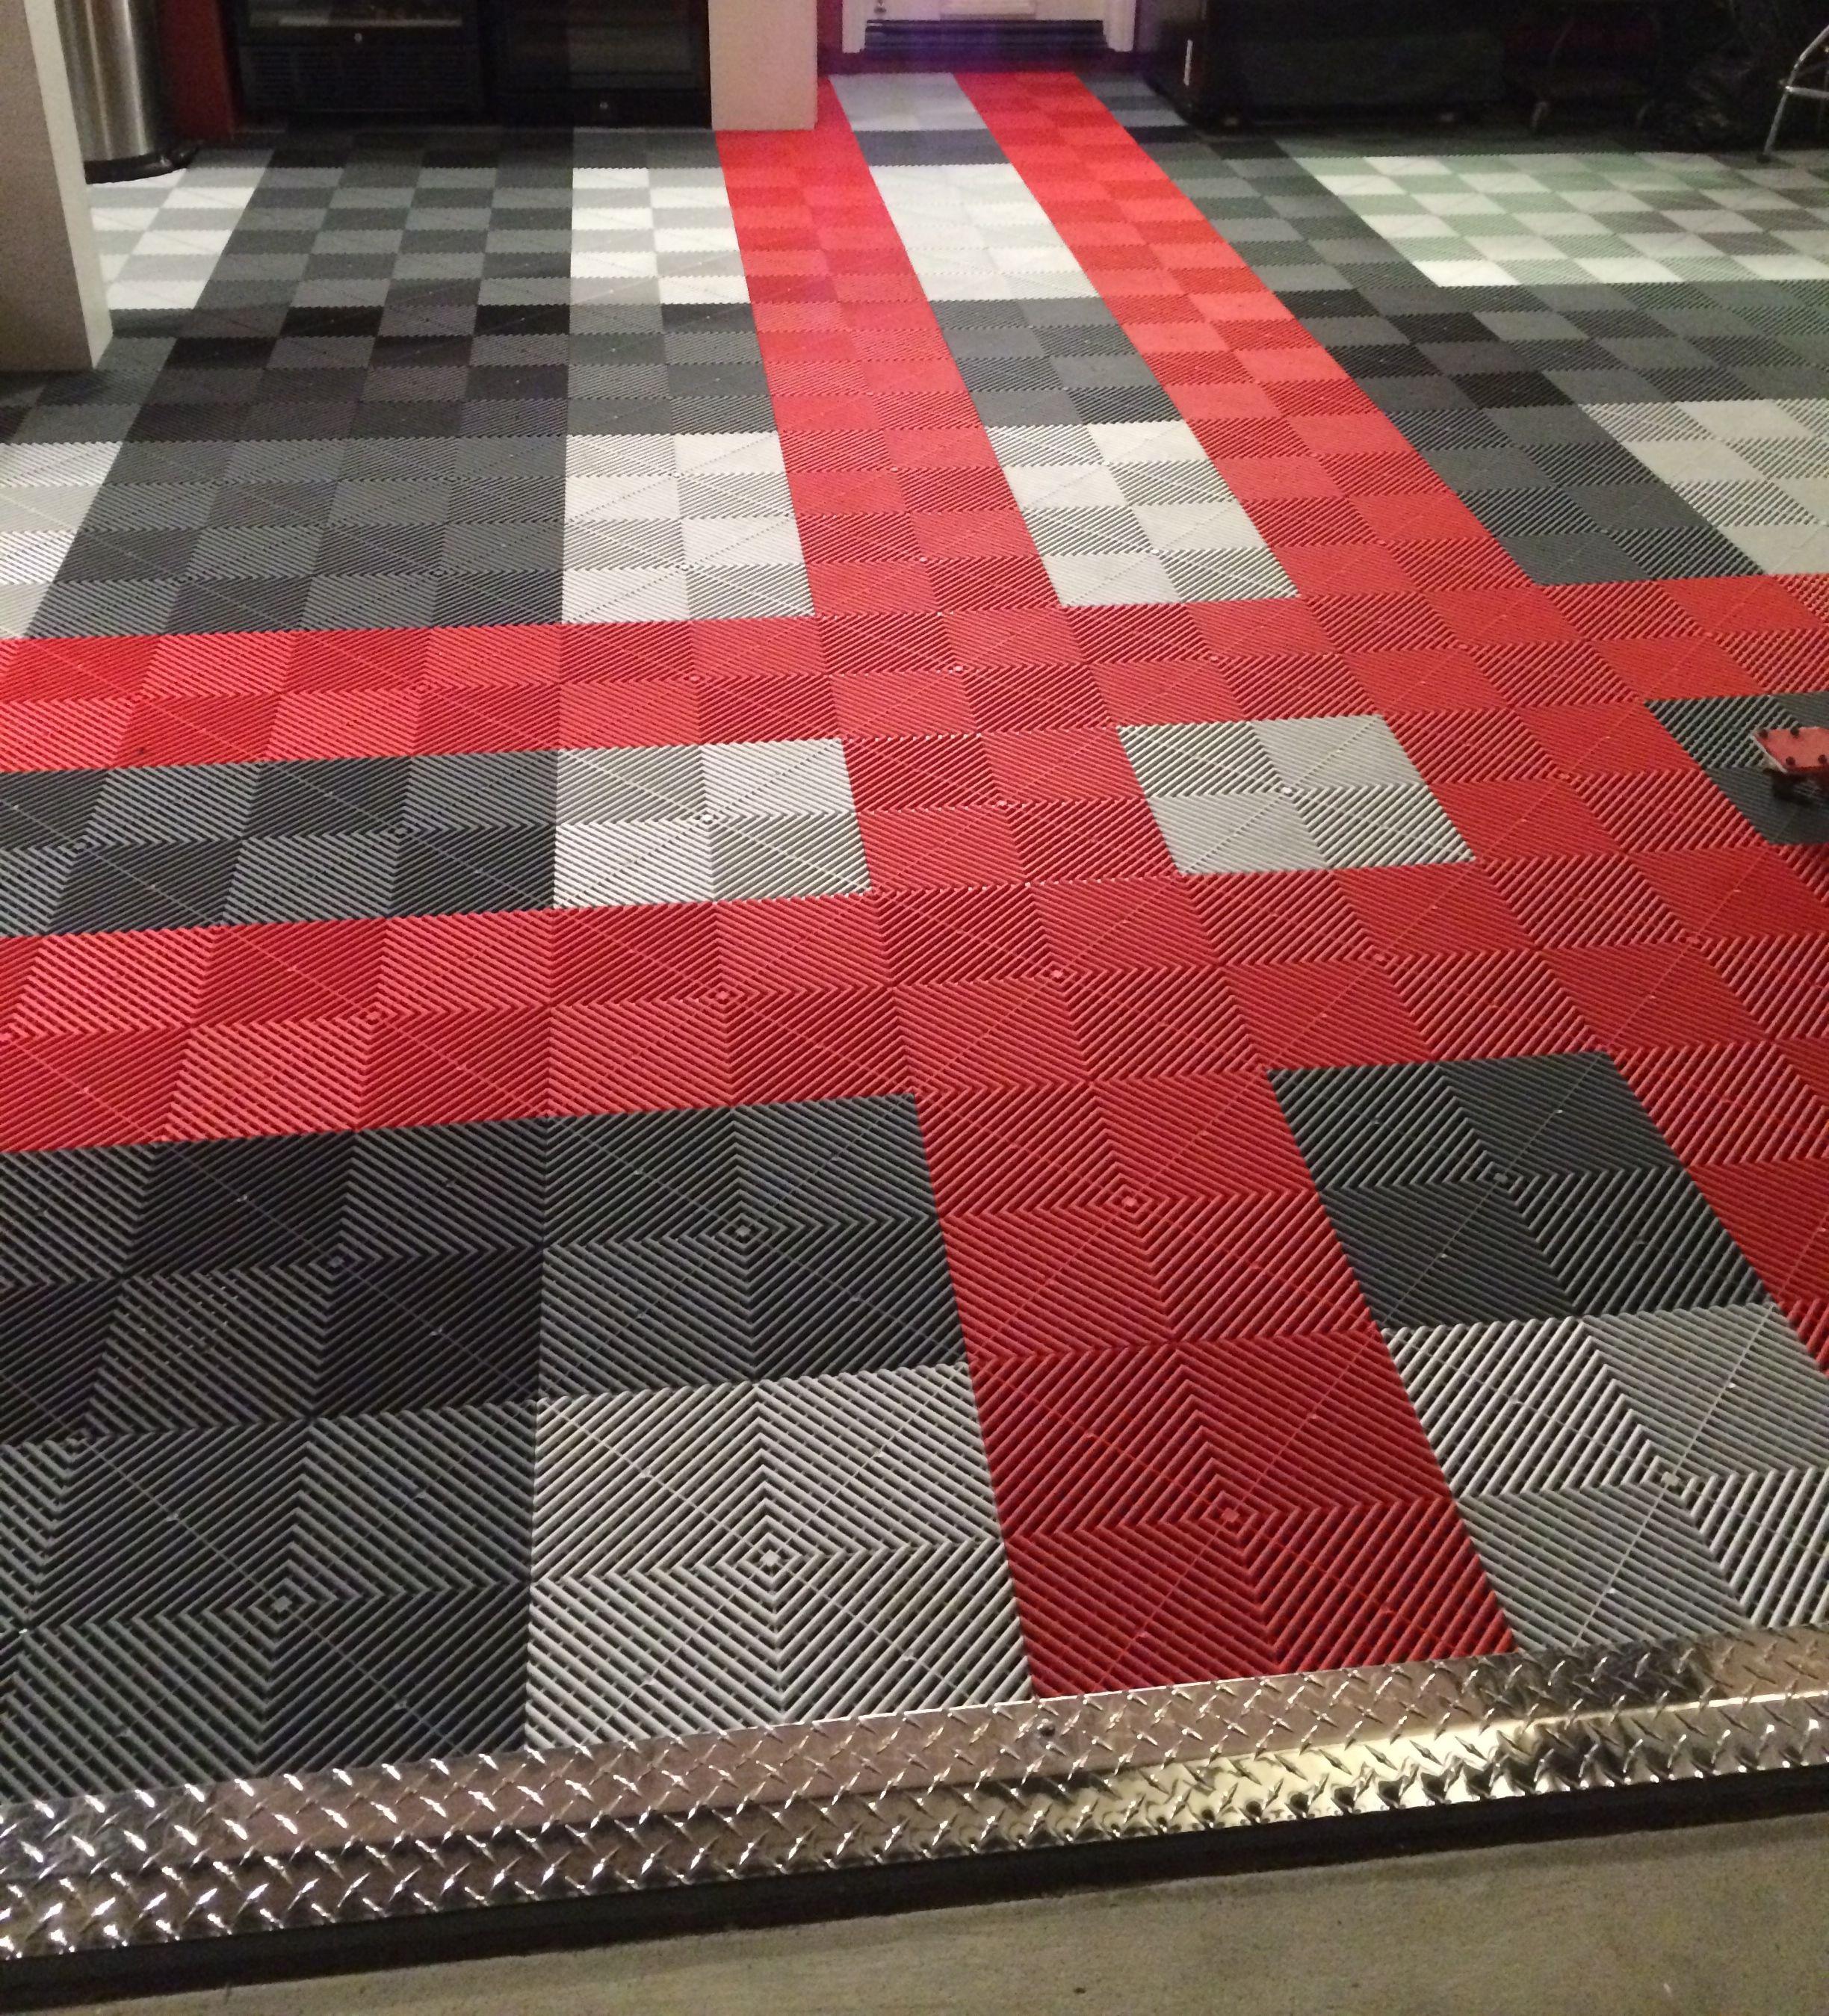 Swisstrax garage flooring ribtrax tile pearl silver racing red garage floor beauty burberry inspired style custom diamond plate ramp transitions modmyfloor dailygadgetfo Gallery